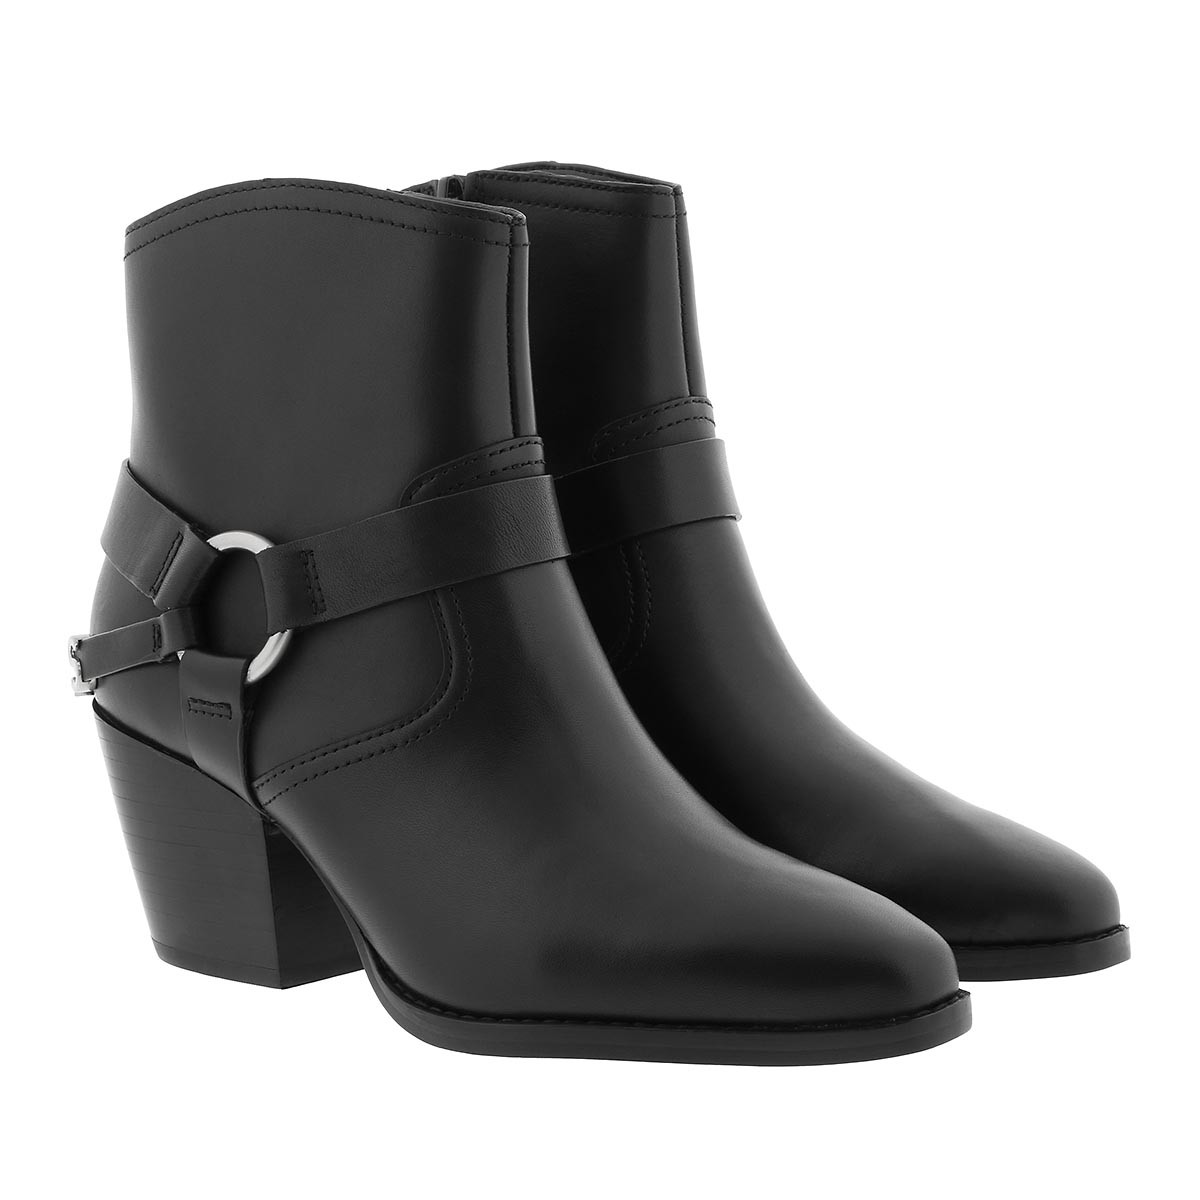 Michael Kors Boots - Goldie Booties Black - in schwarz - für Damen